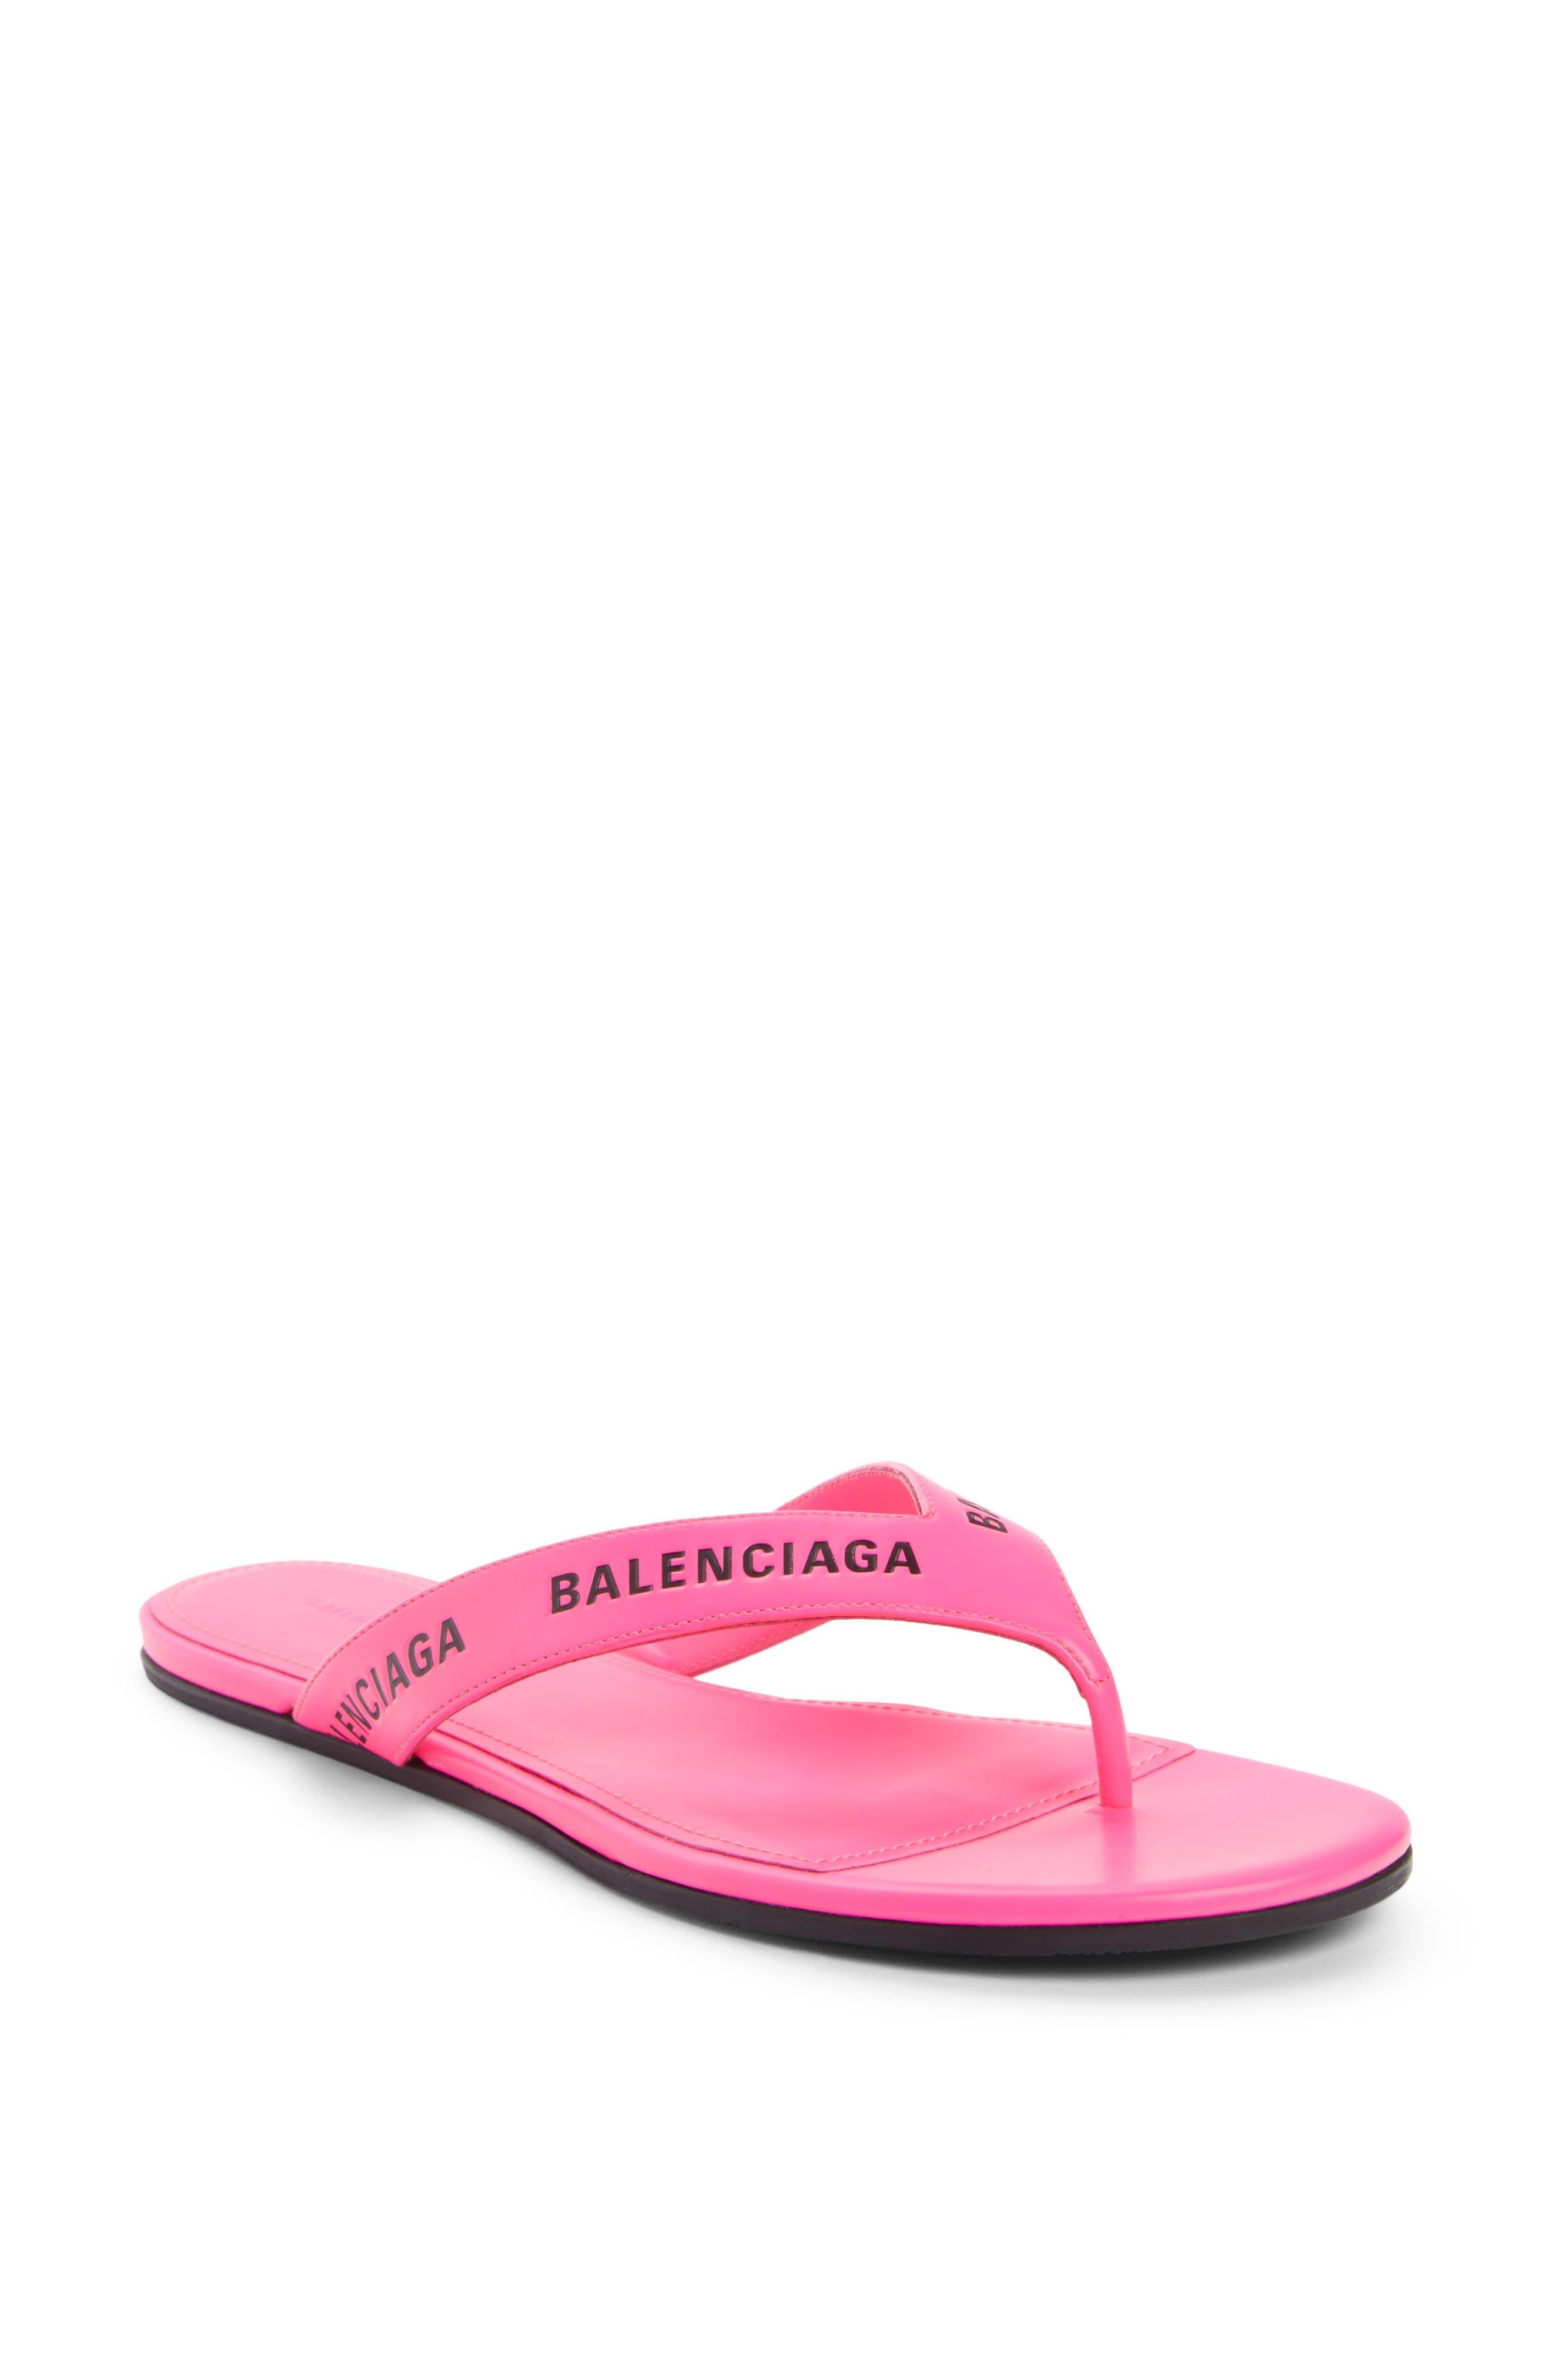 Women's Balenciaga Sandals and Flip